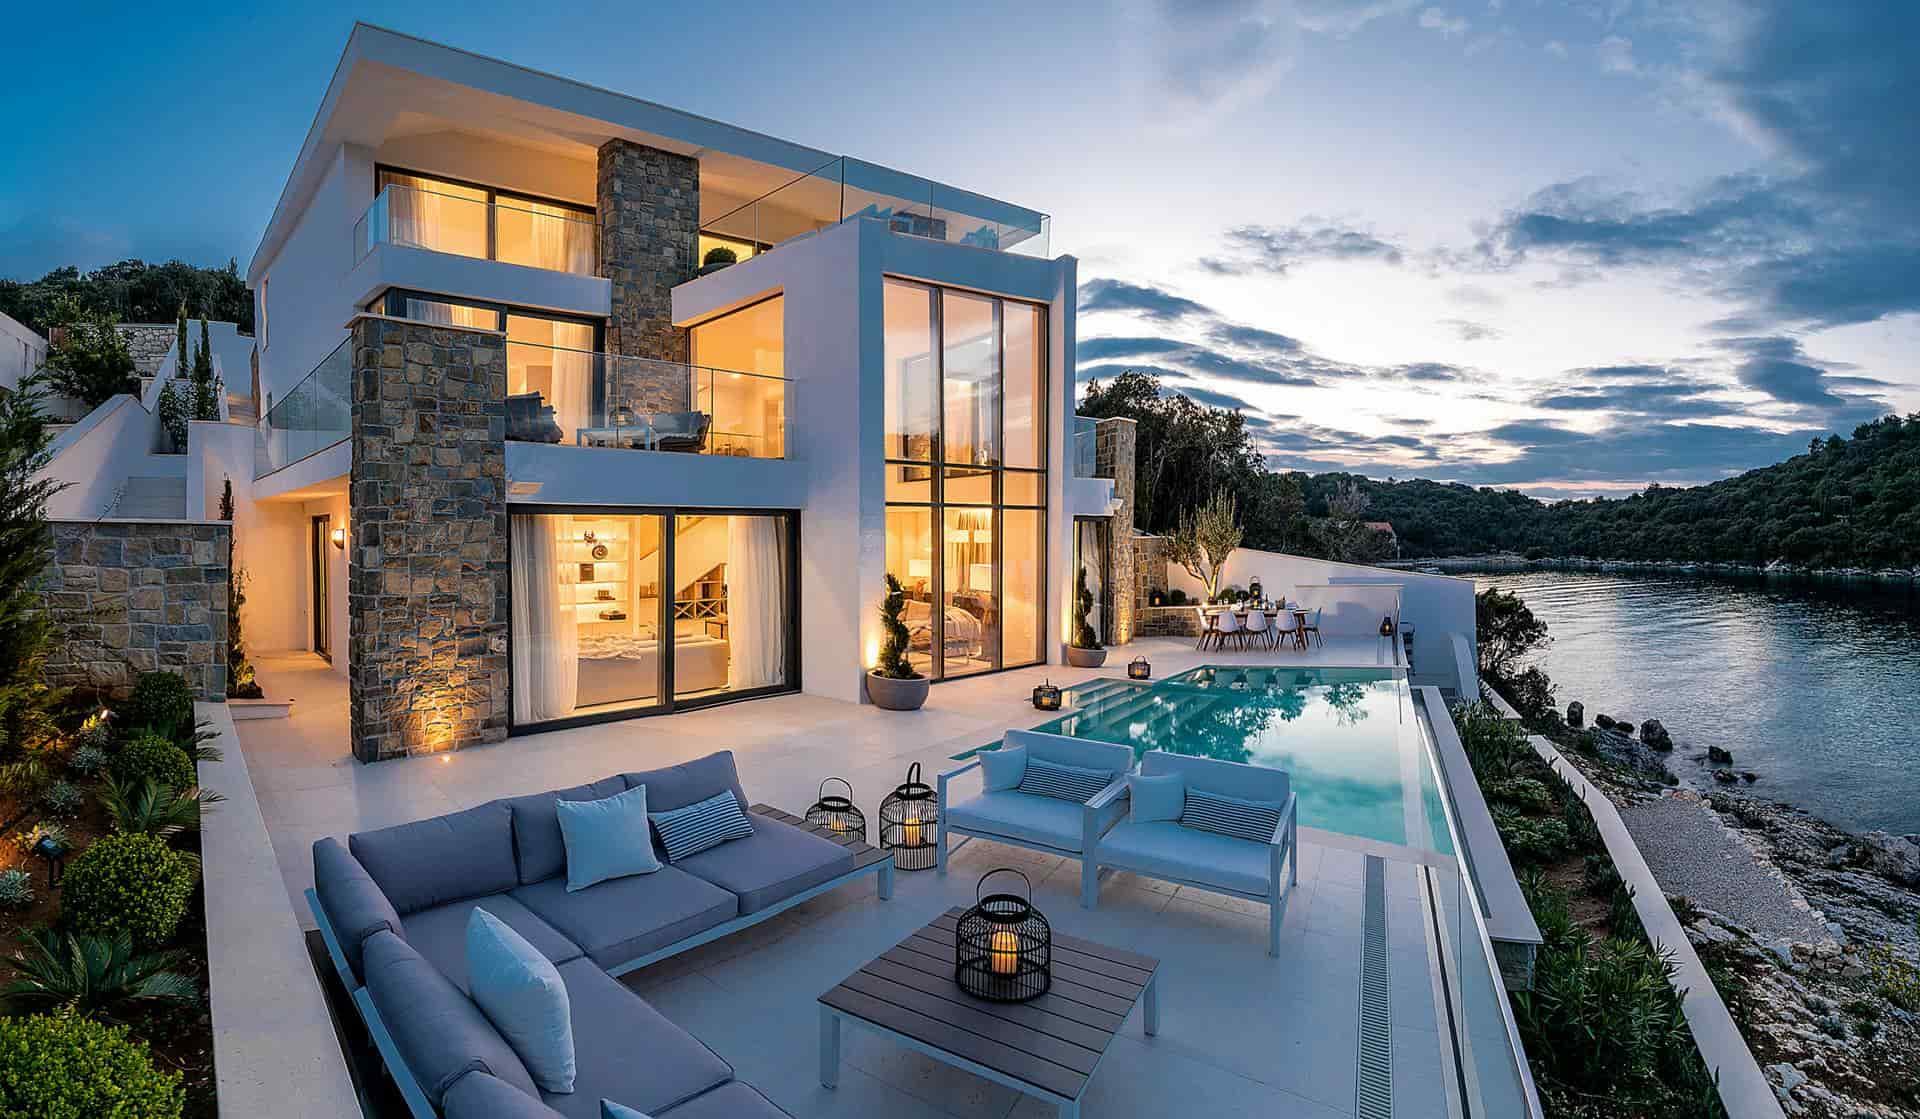 Eskluzivna vila na samom moru s bazenom